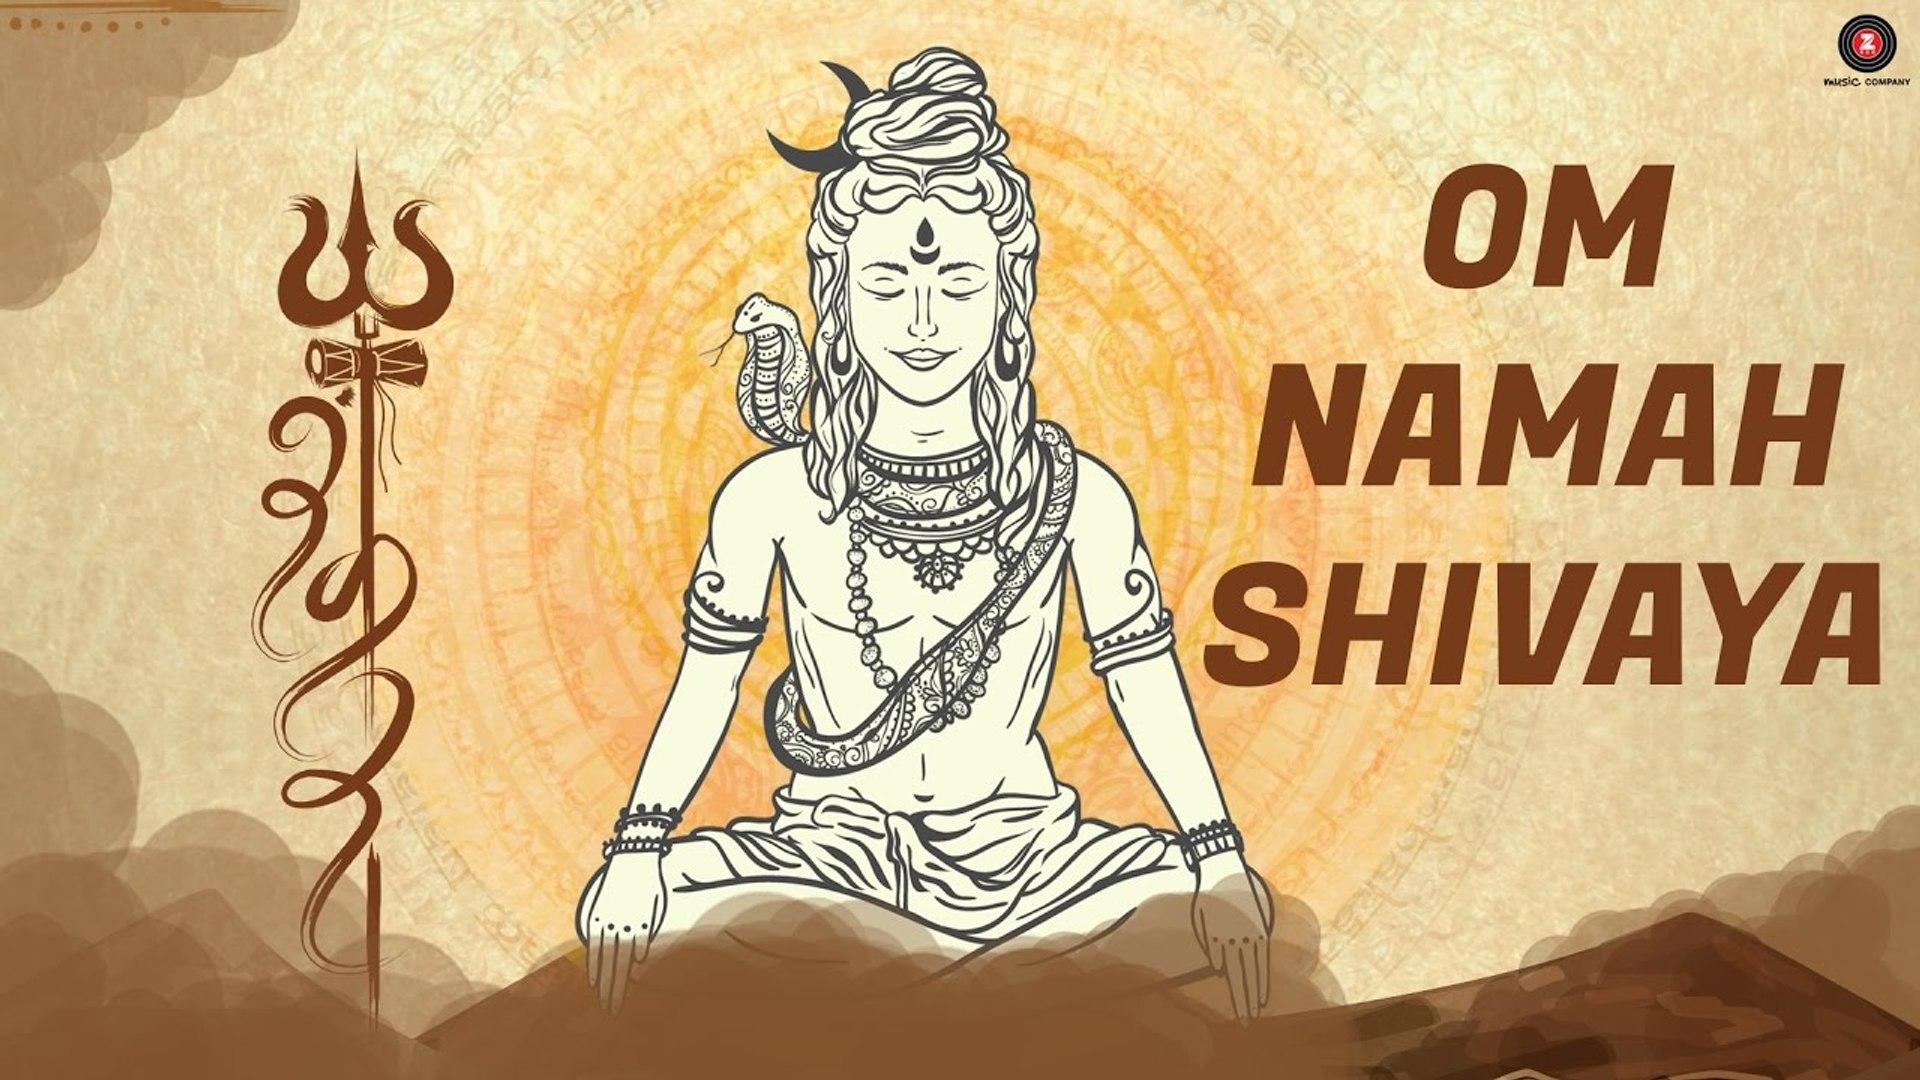 Om Namah Shivaya Video Song Mantra Lord Shiva Bhajan Meditation Video Dailymotion